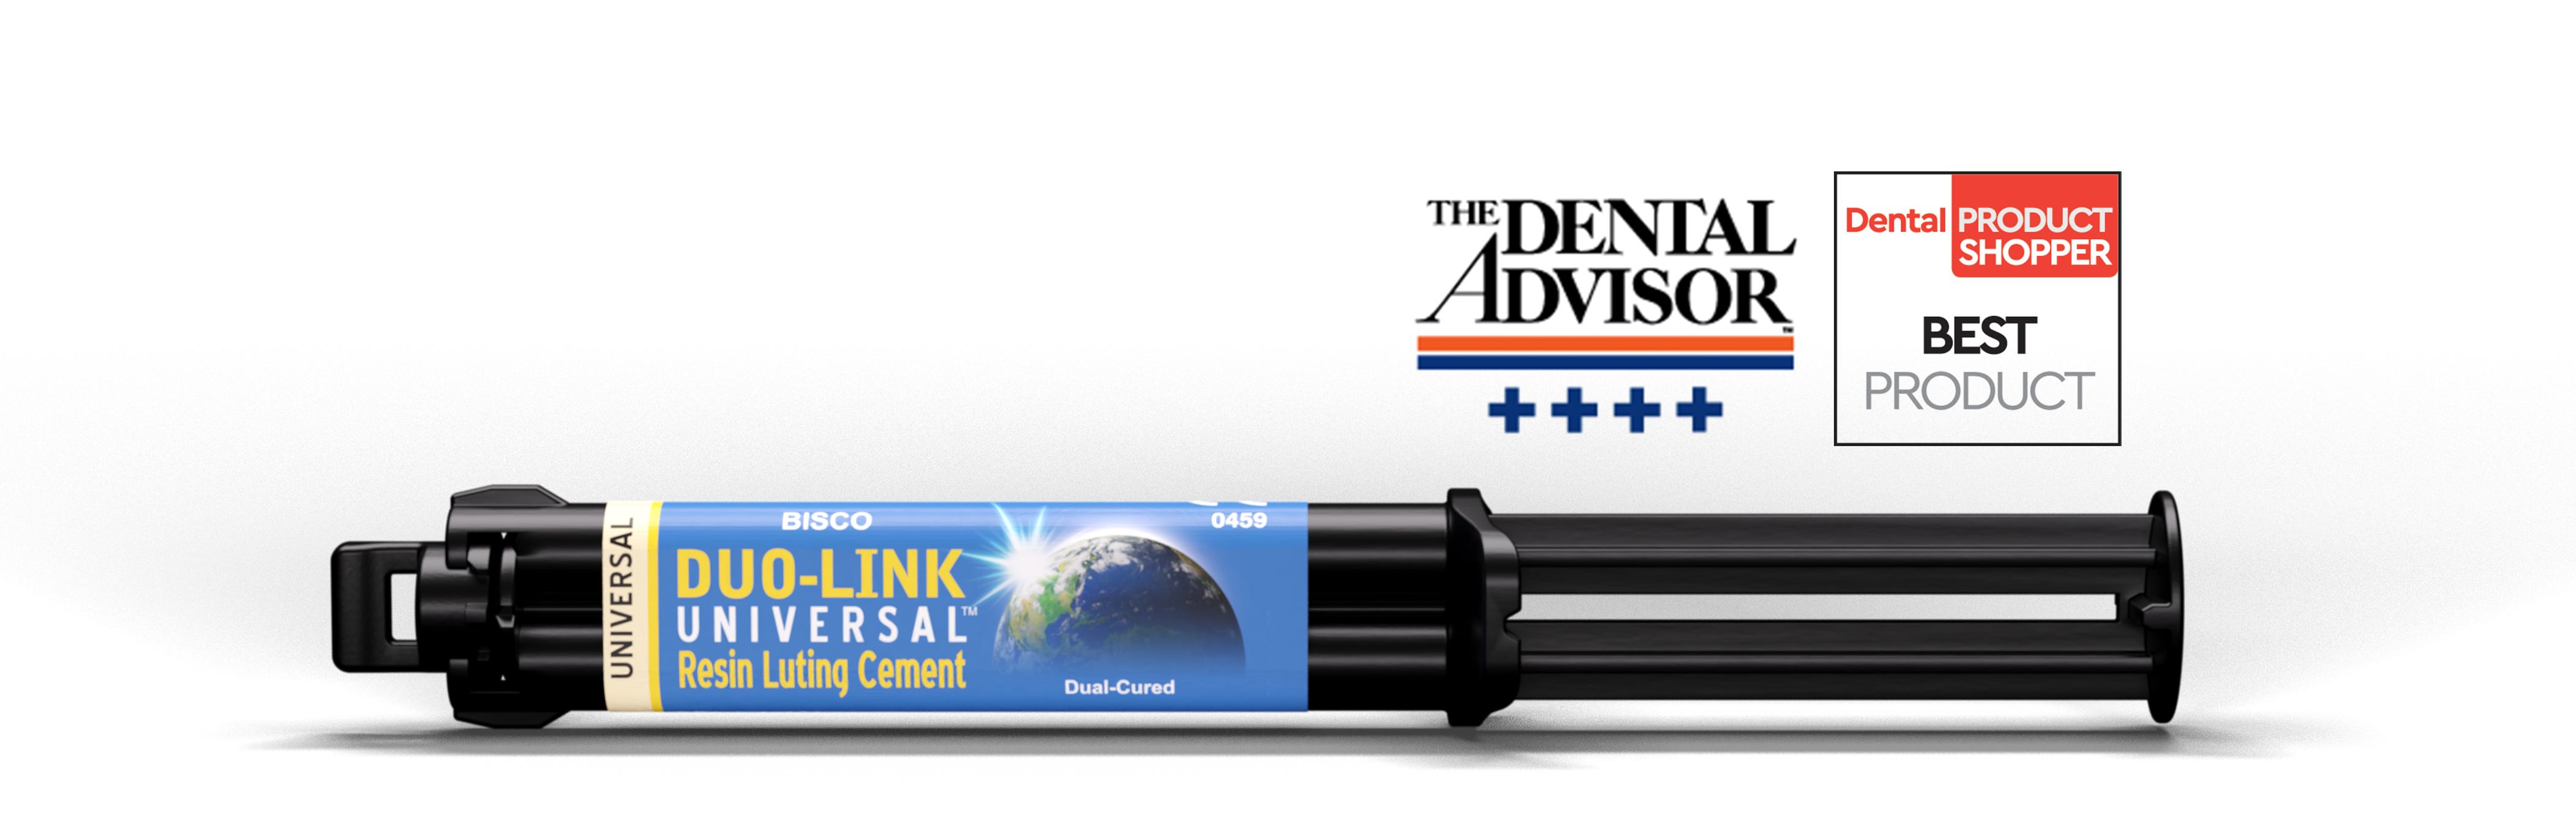 Duo Link Universal Syringe-4